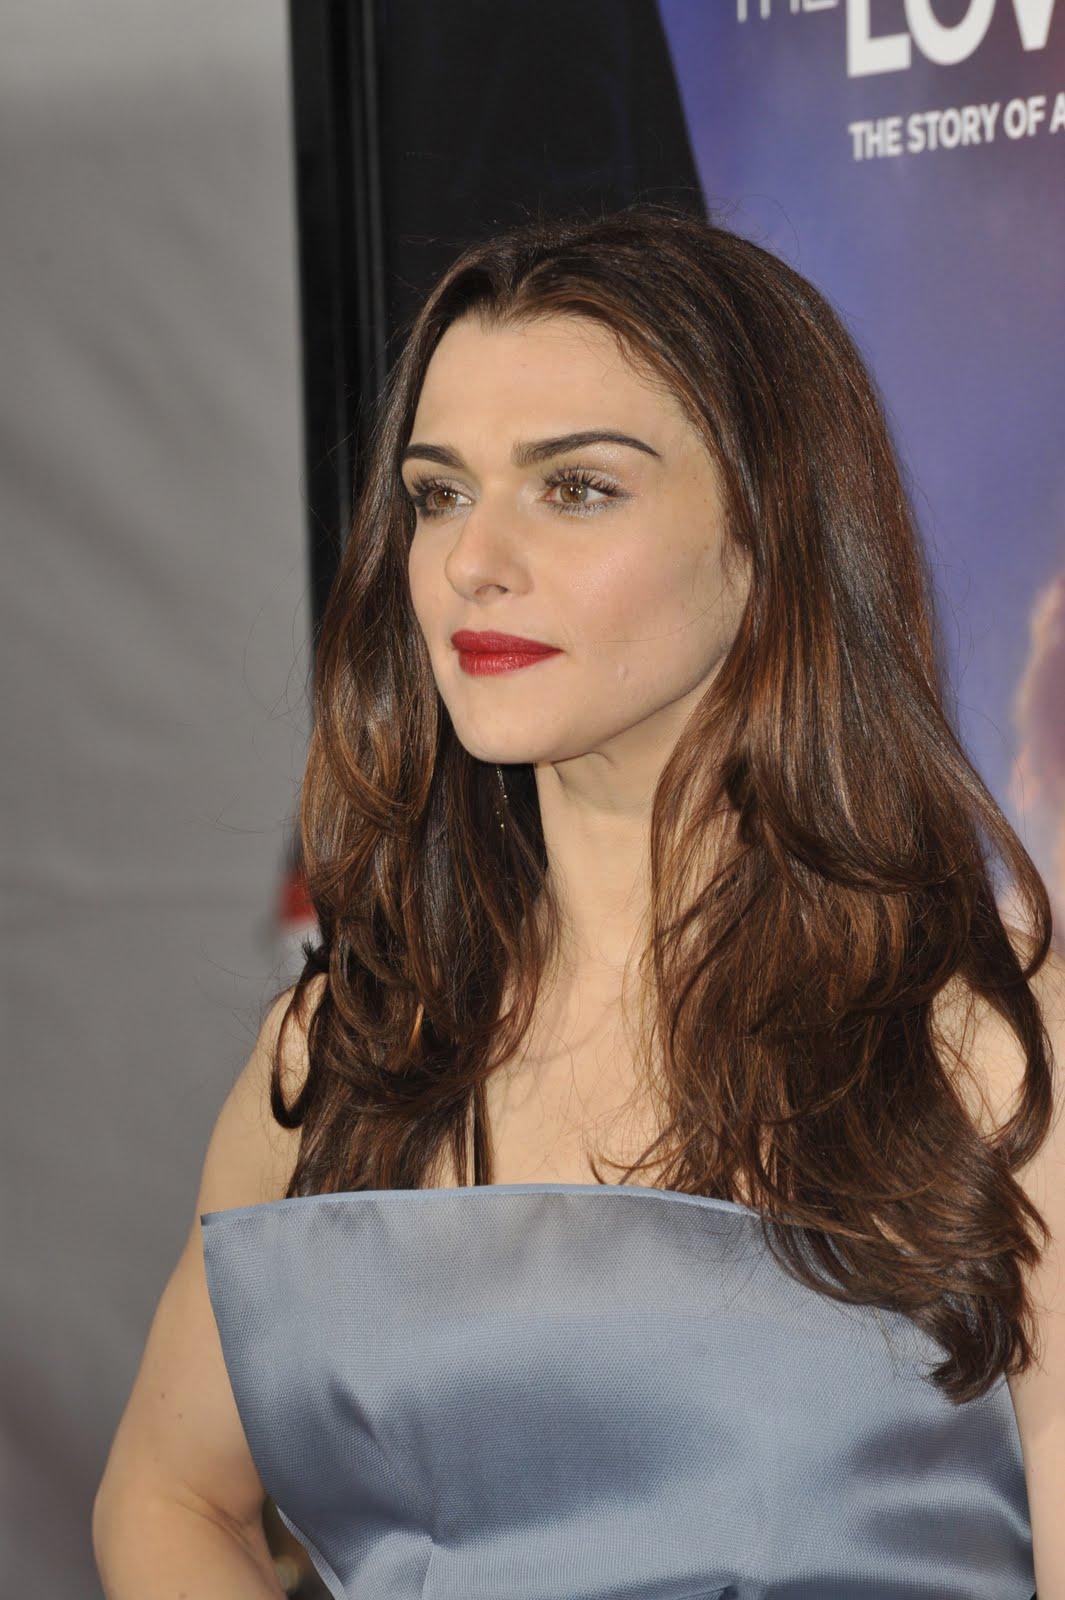 [63148_celebrity-paradise_com-The_Elder-Rachel_Weisz_2009-12-07_-_LA_premier_of_The_Lovely_Bones_5103_122_559lo.jpg]